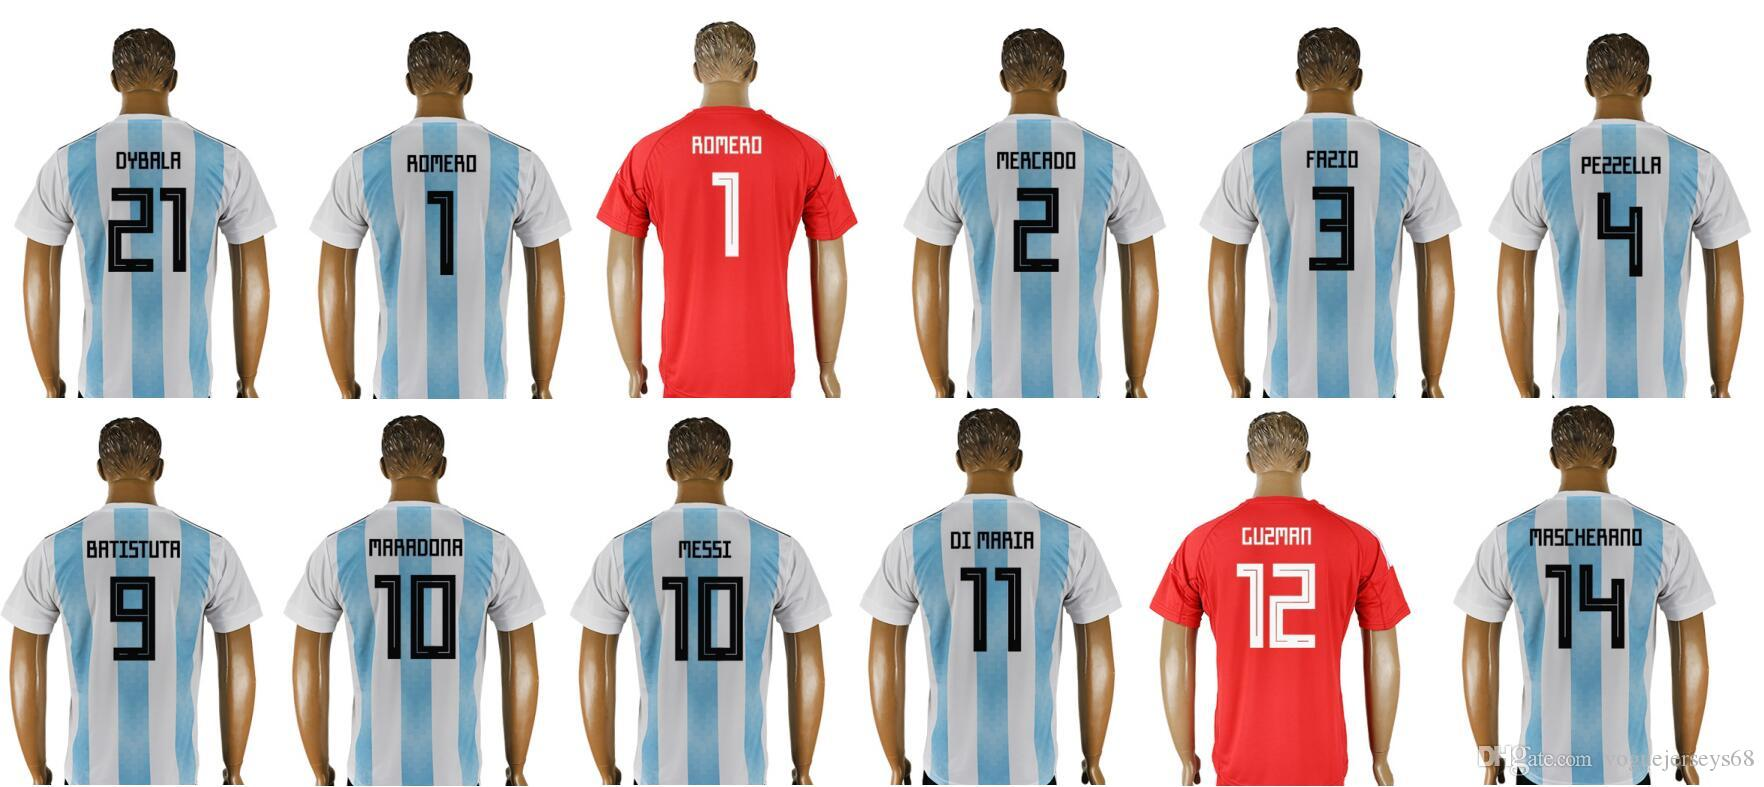 Mens 2018 Argentina Team   1 Sergio Romero Diego Maradona 9 Gabriel  Batistuta 10 Lionel Messi Uniformes Camisetas Deportes Fútbol Jerseys  Baratos Por ... 4c662805be02e